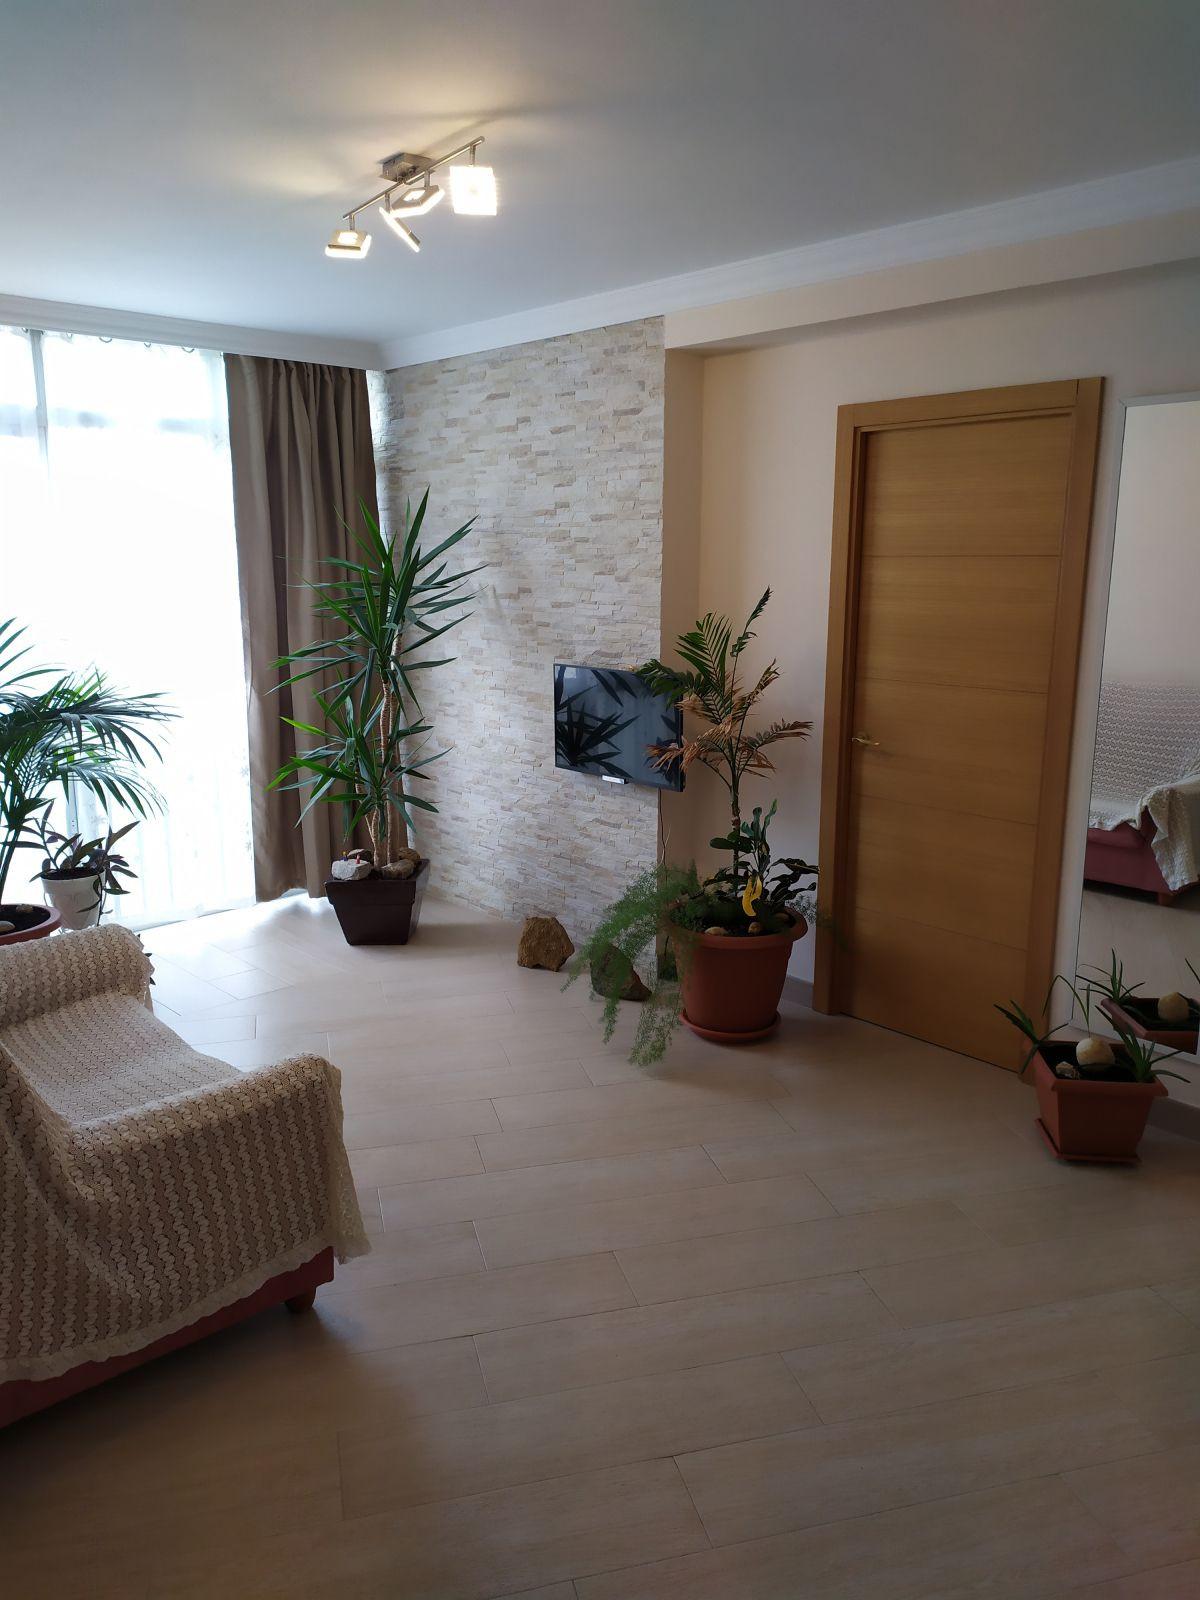 Апартамент - Fuengirola - R3639224 - mibgroup.es